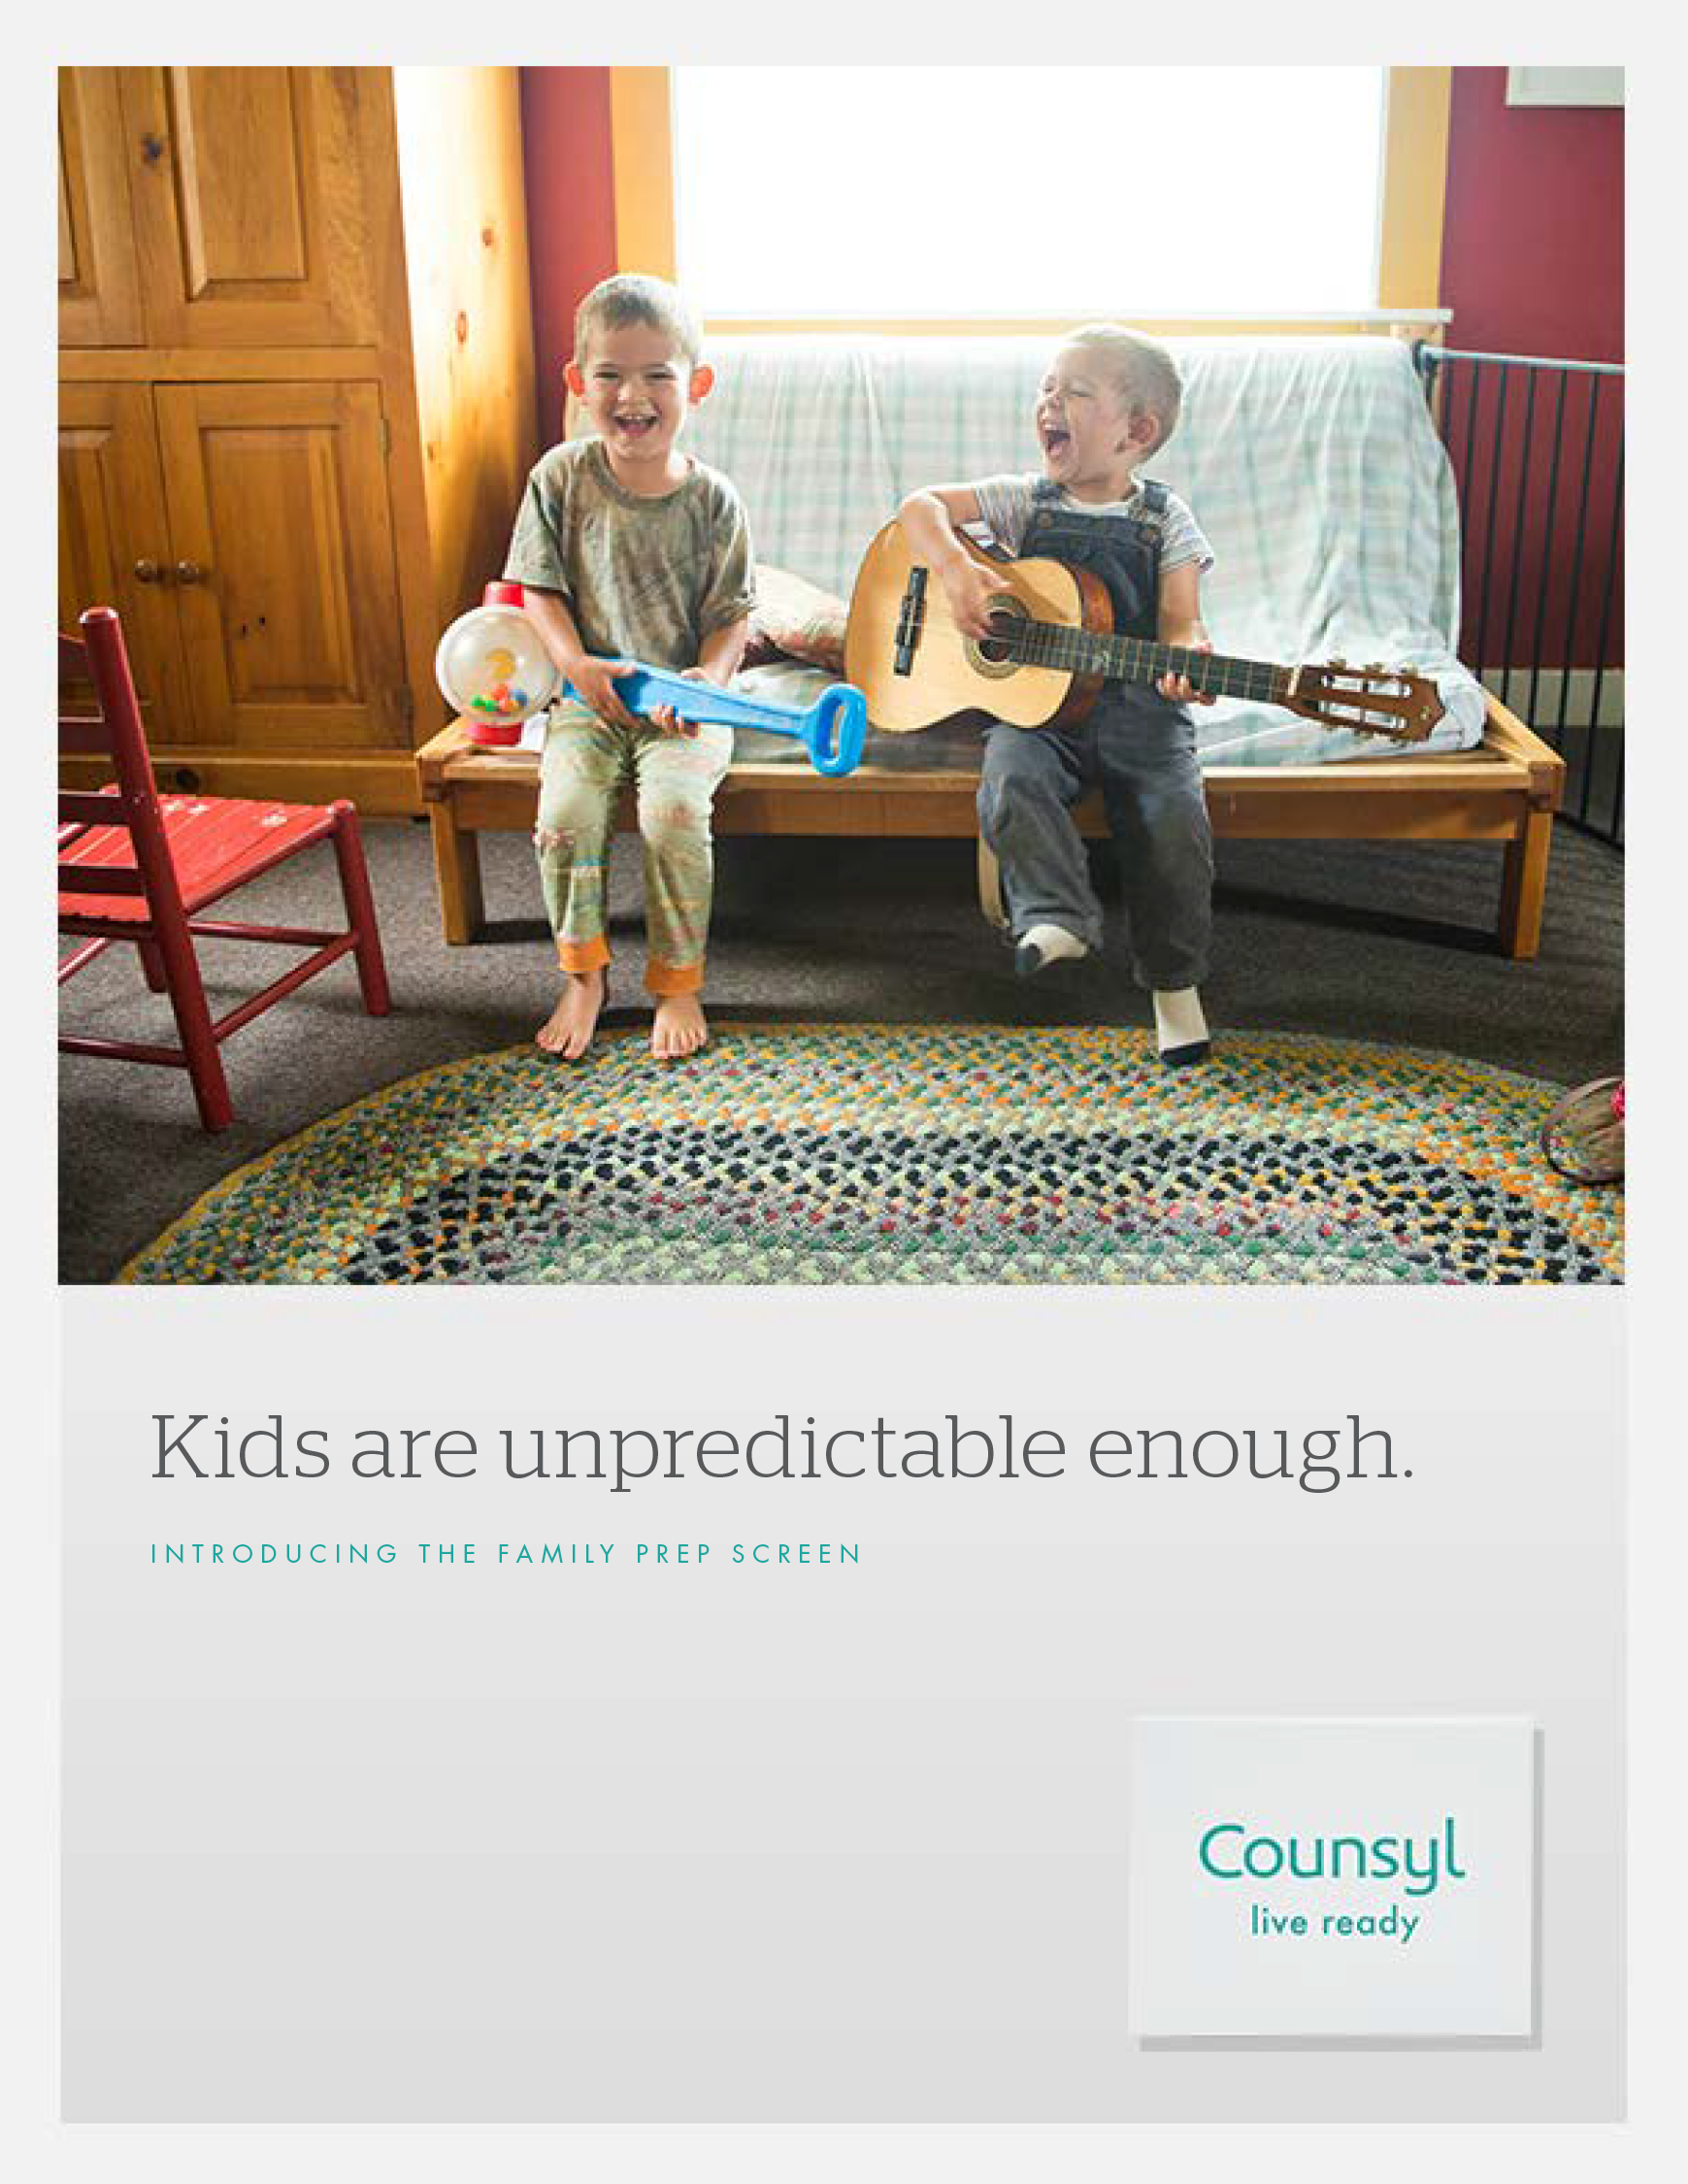 kids_ads-2.png